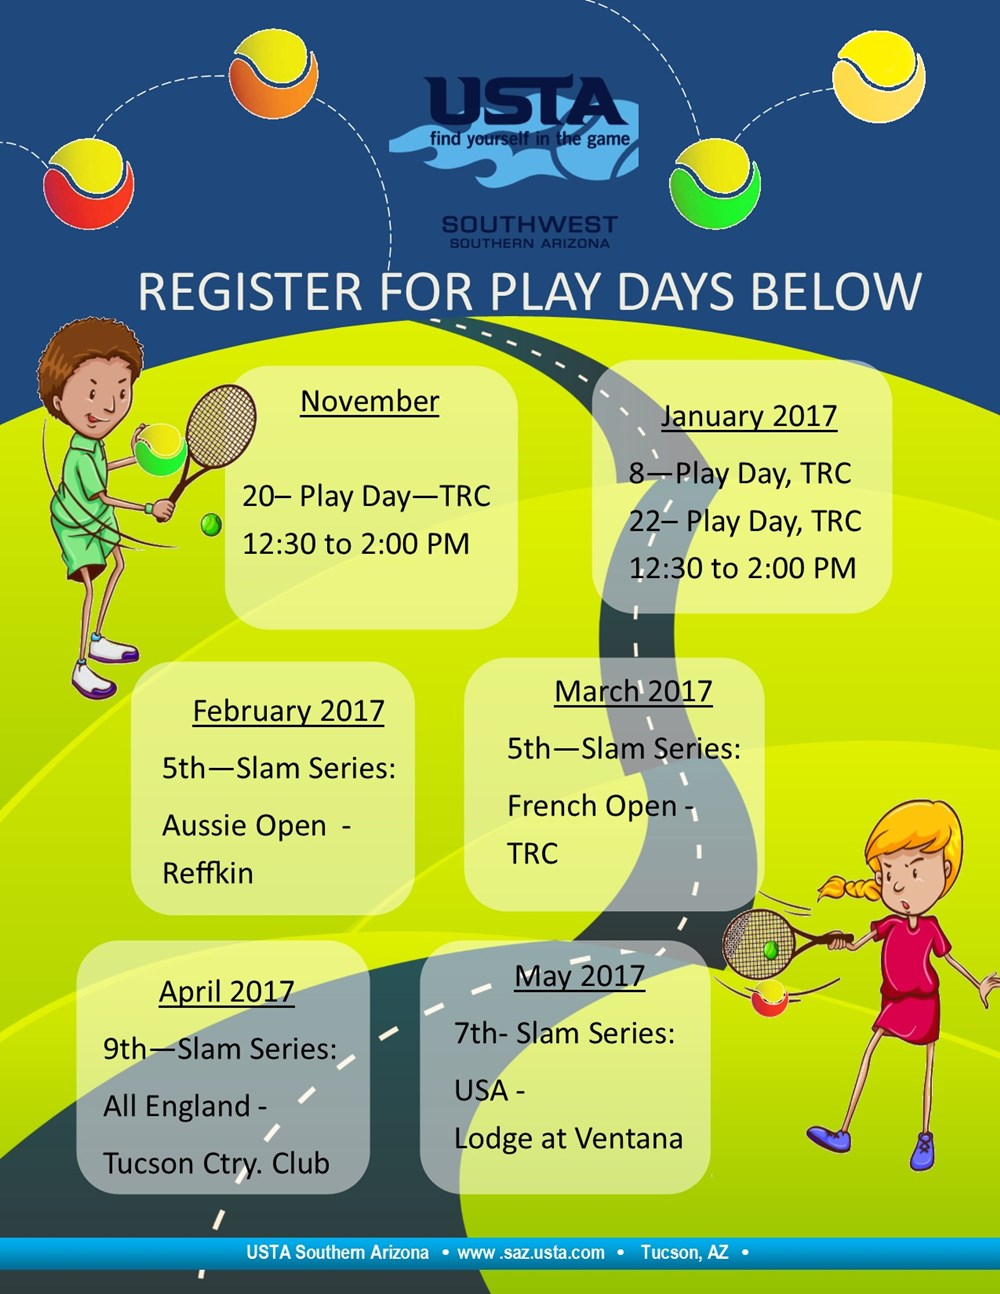 saz_calendar_flyer_register